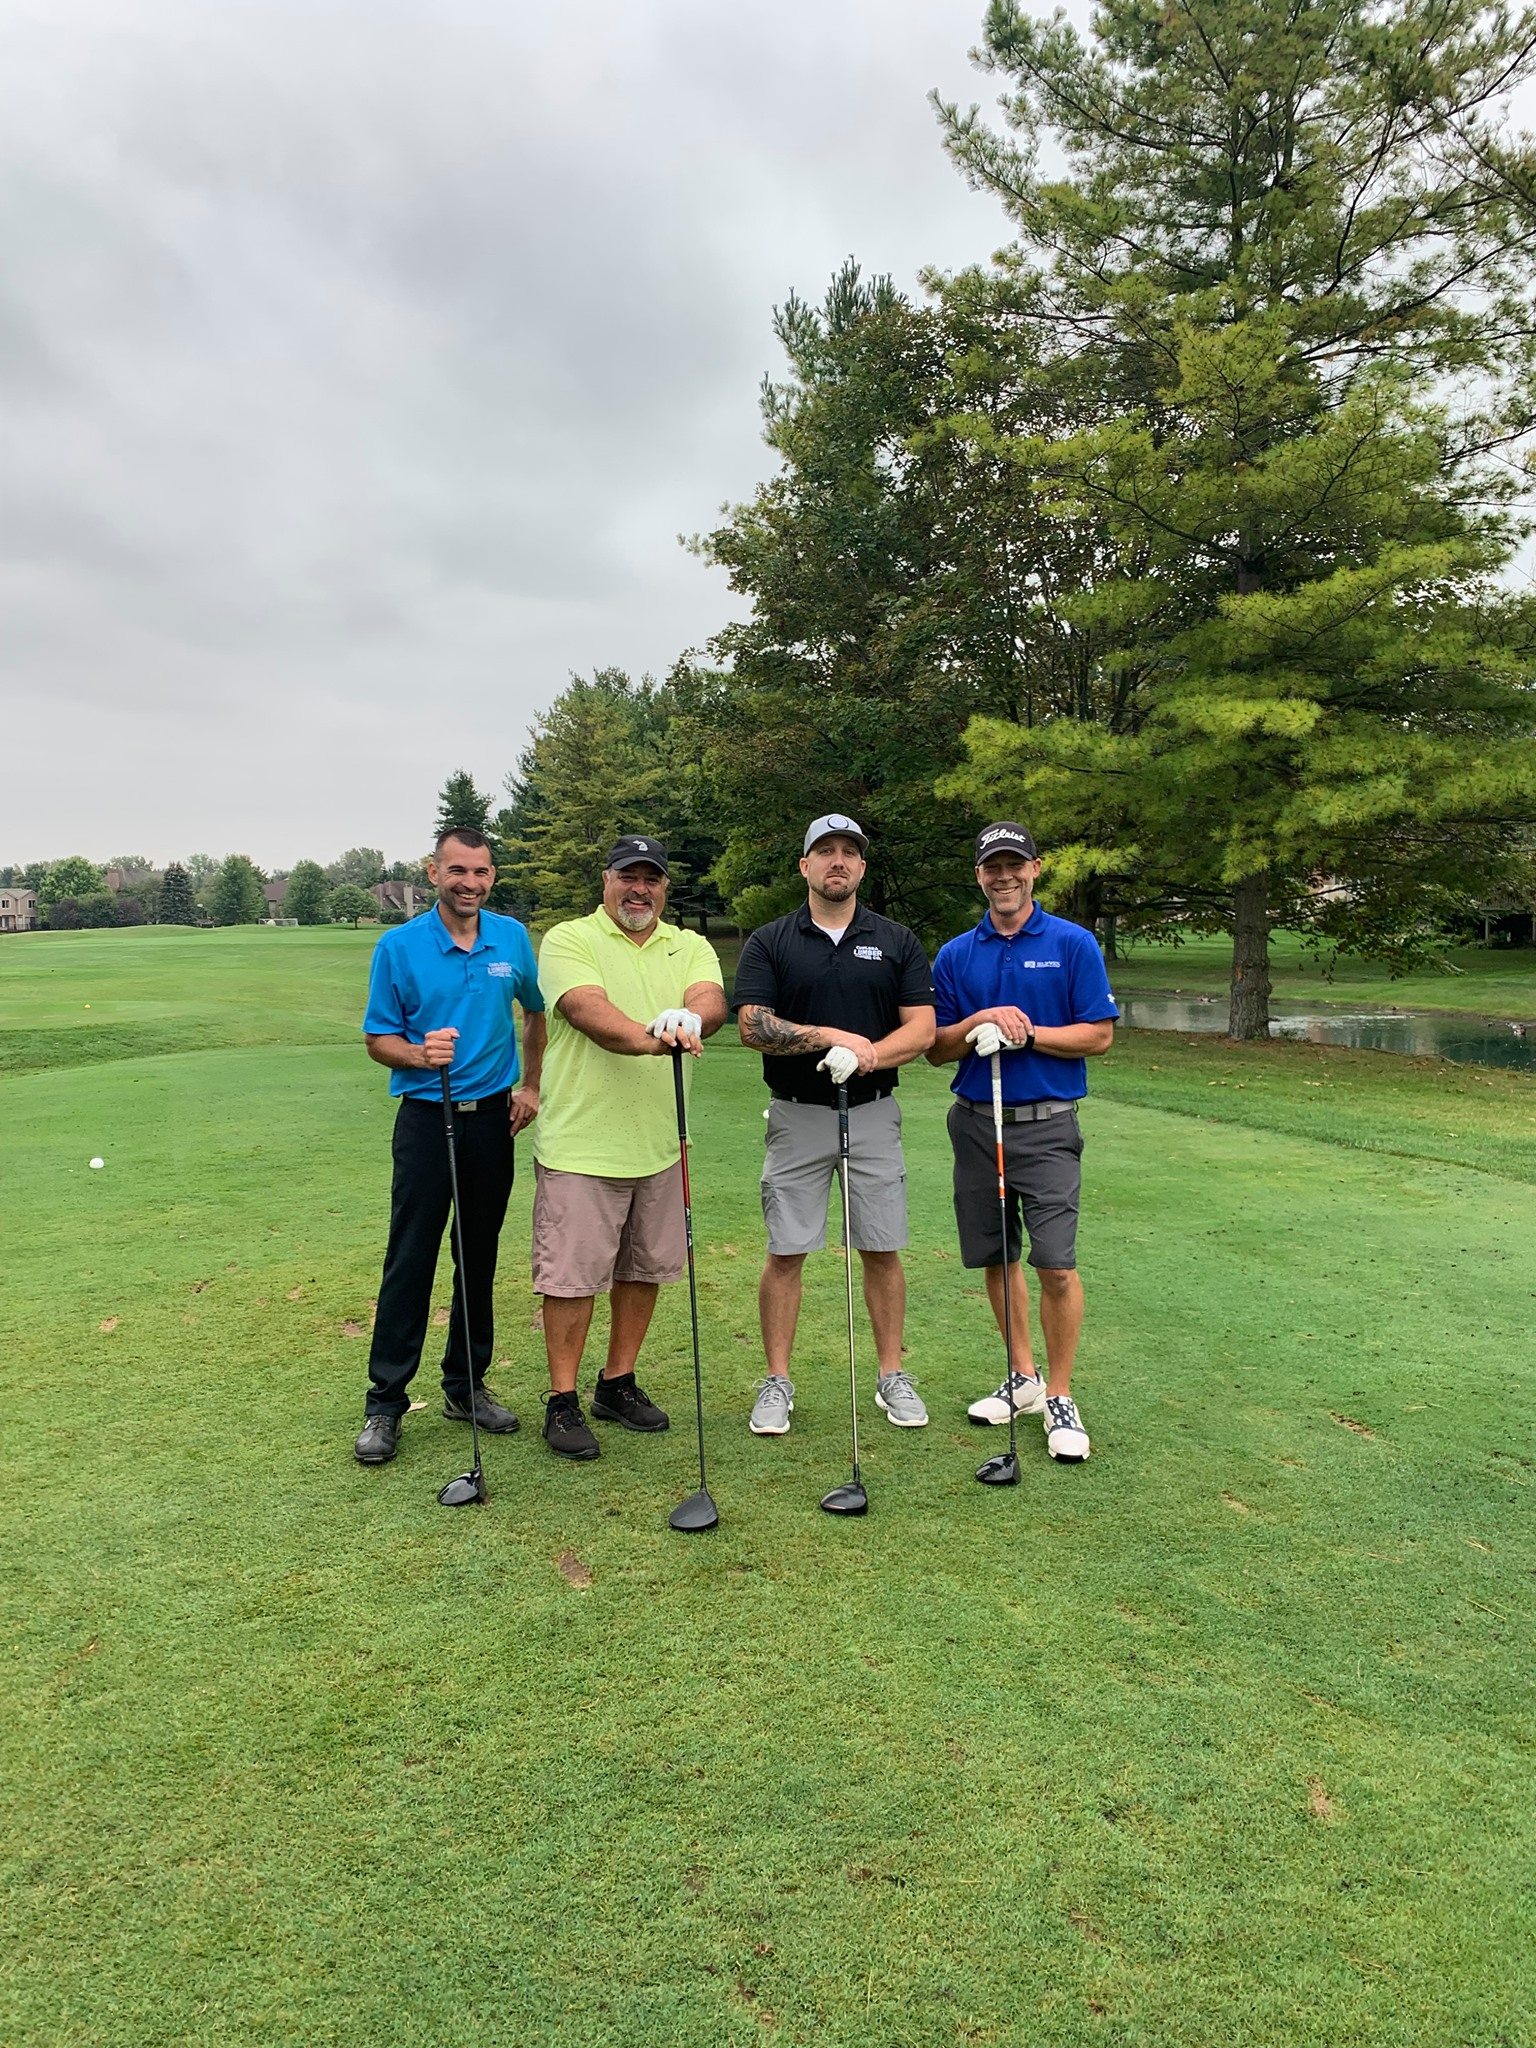 SACC-Golf-Outing-2021-Chelsea-Lumber.jpg